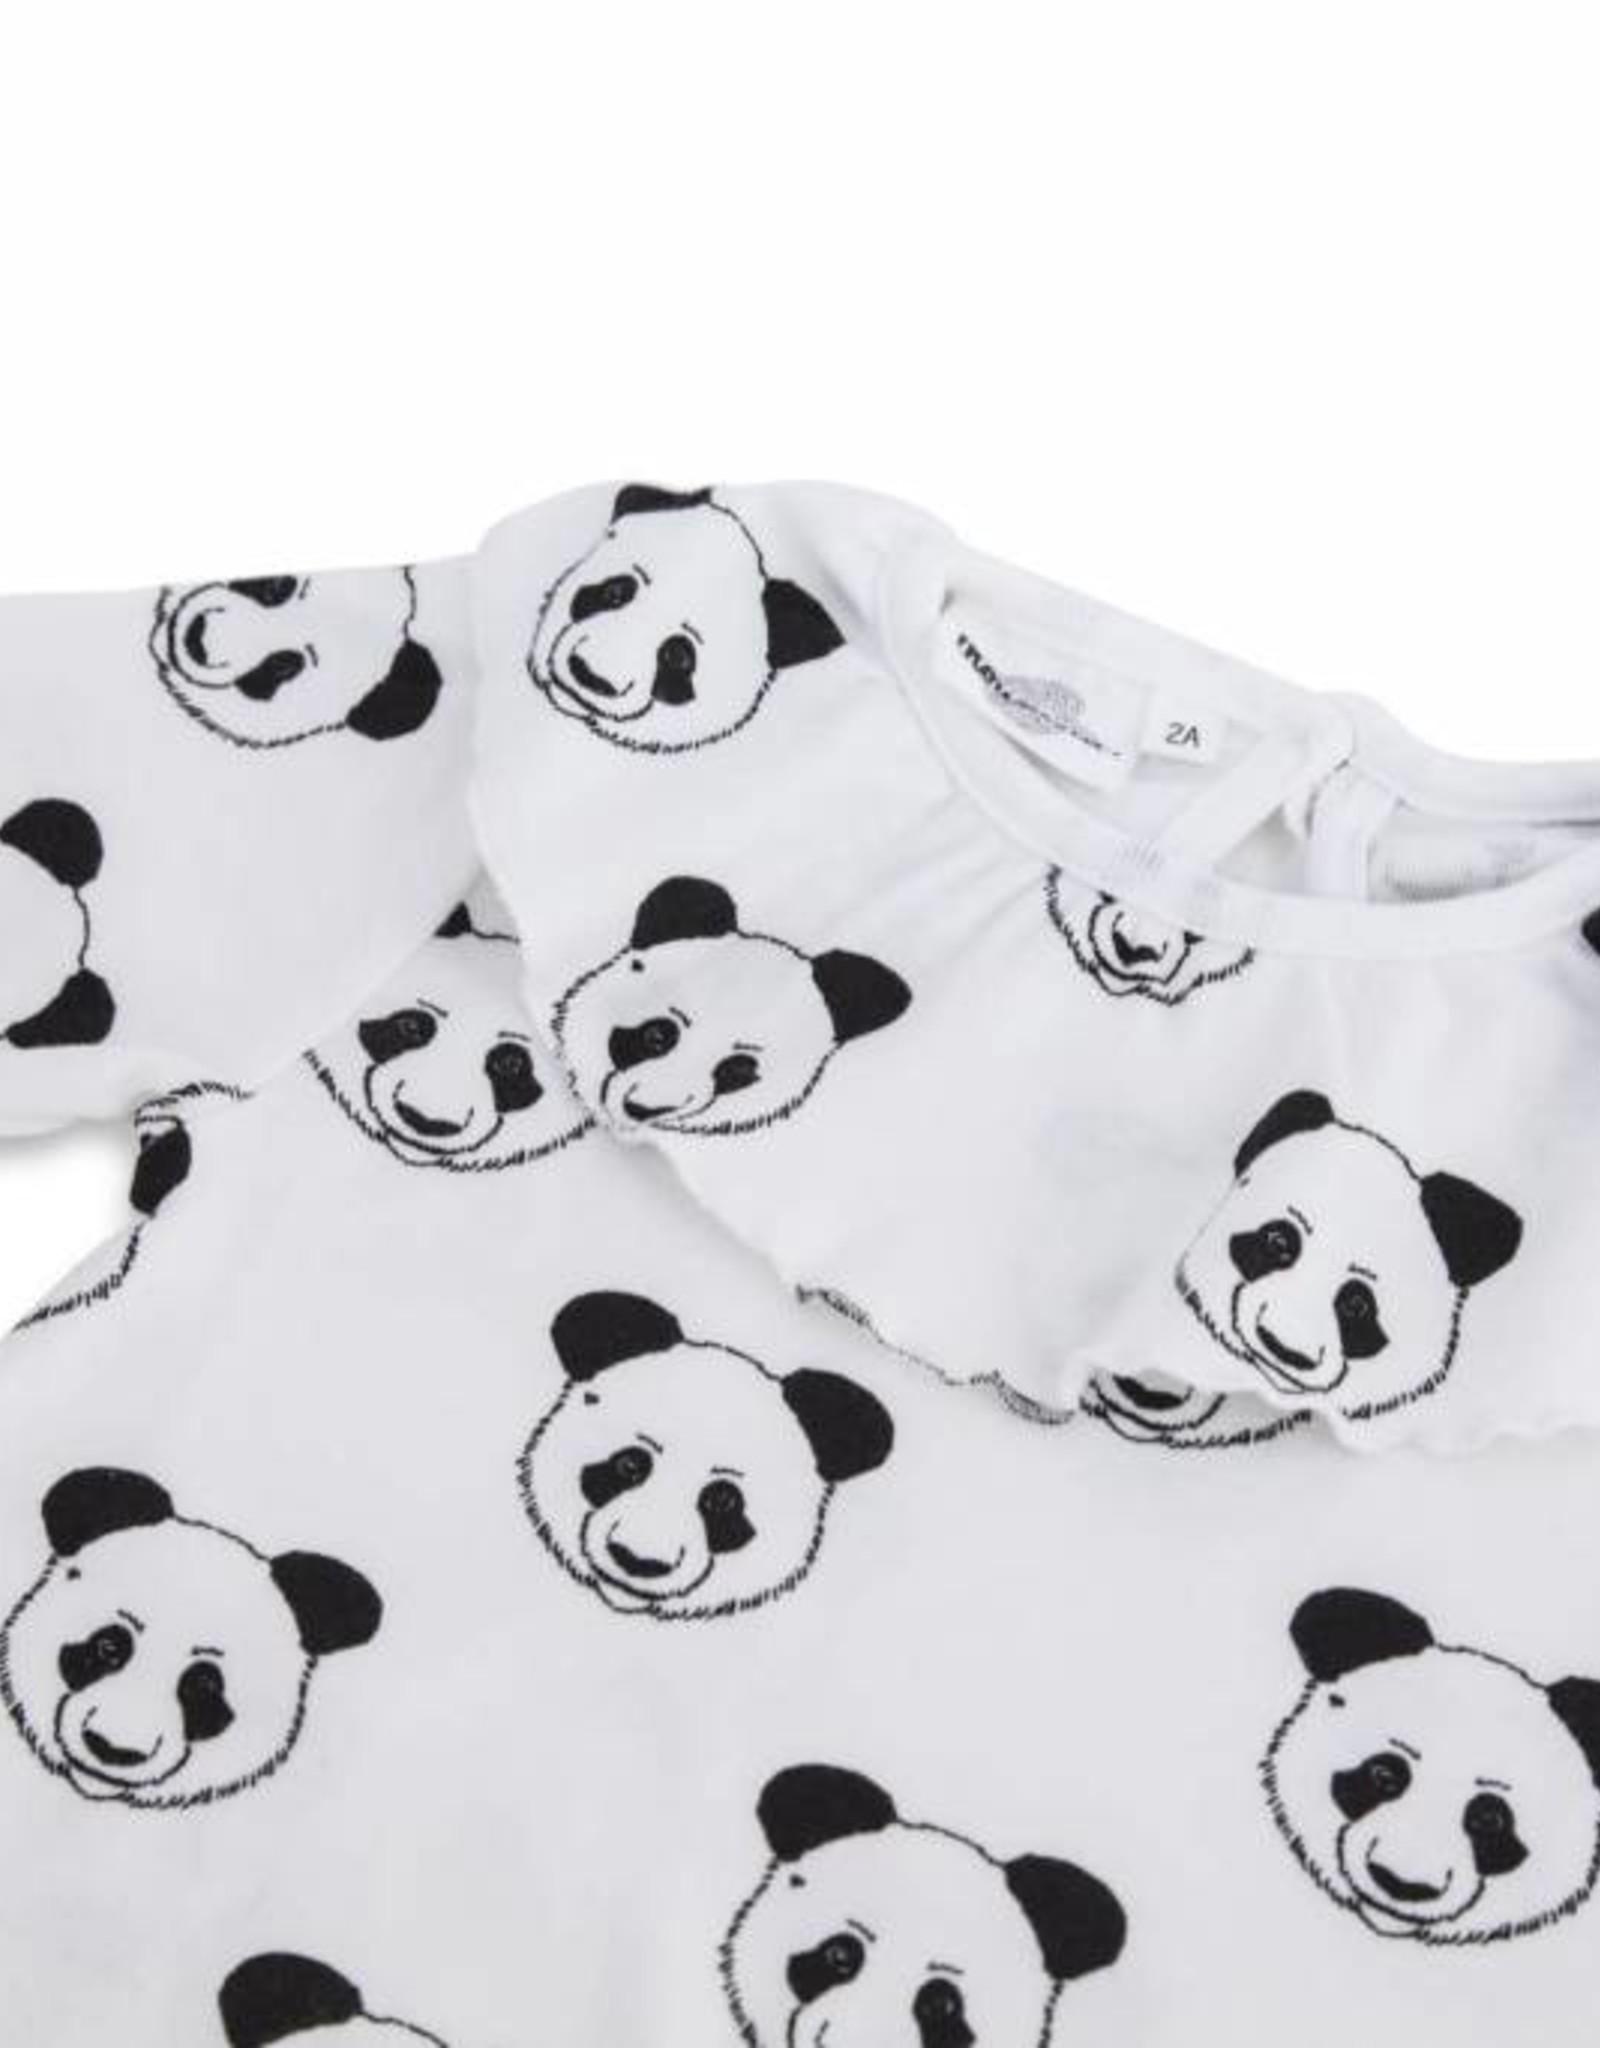 Moli nightgown, pandas print